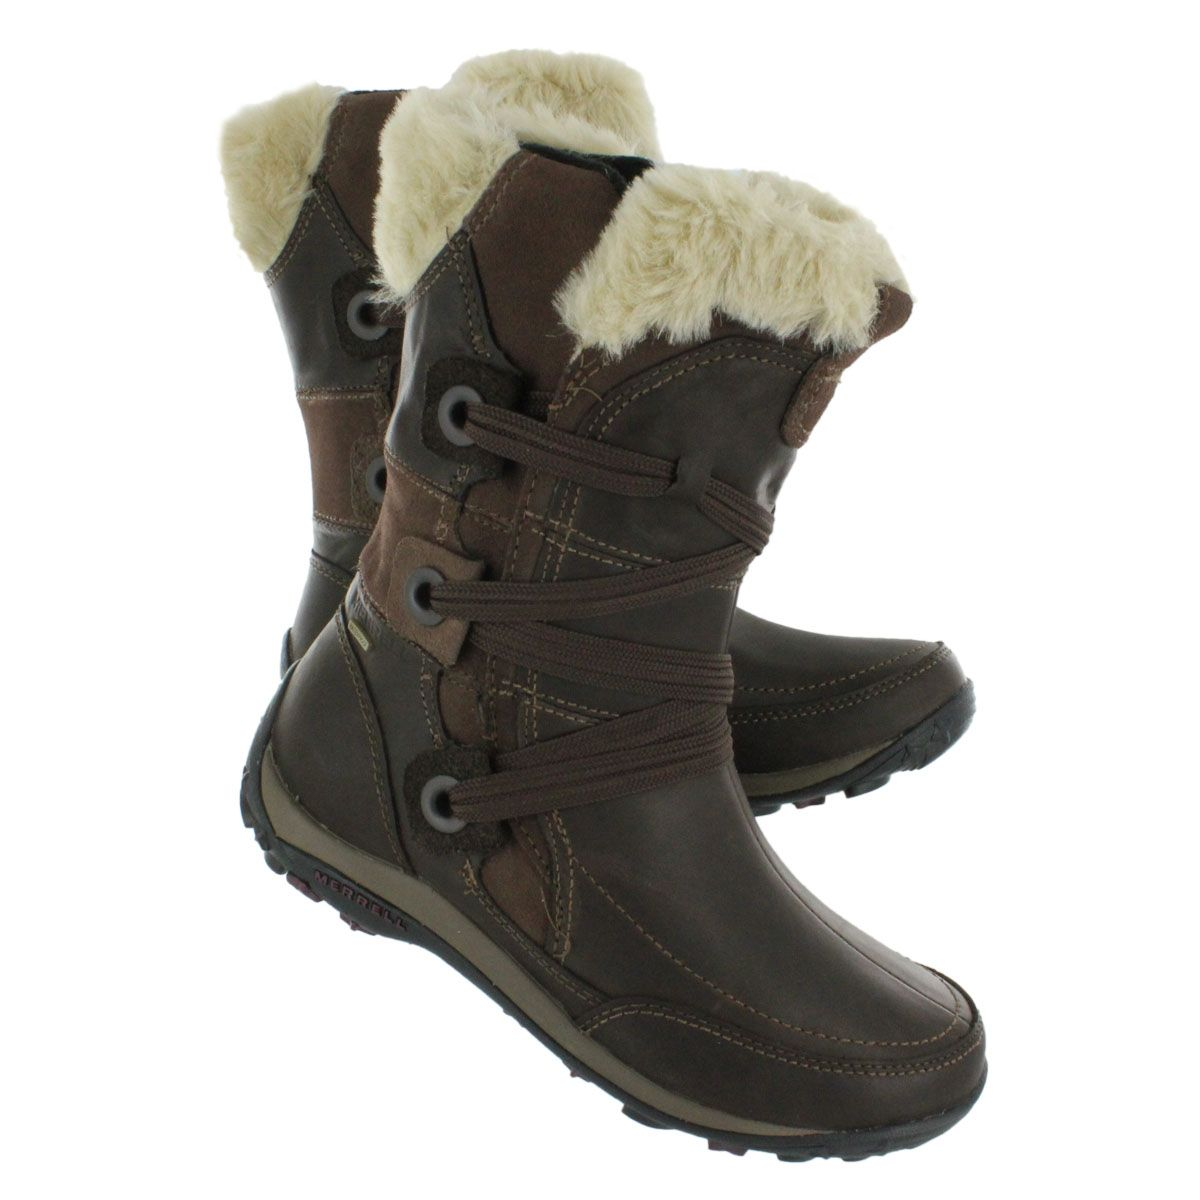 7f540276a39f8 Merrell Women's NIKITA waterproof chocolate winter boots 55888 ...